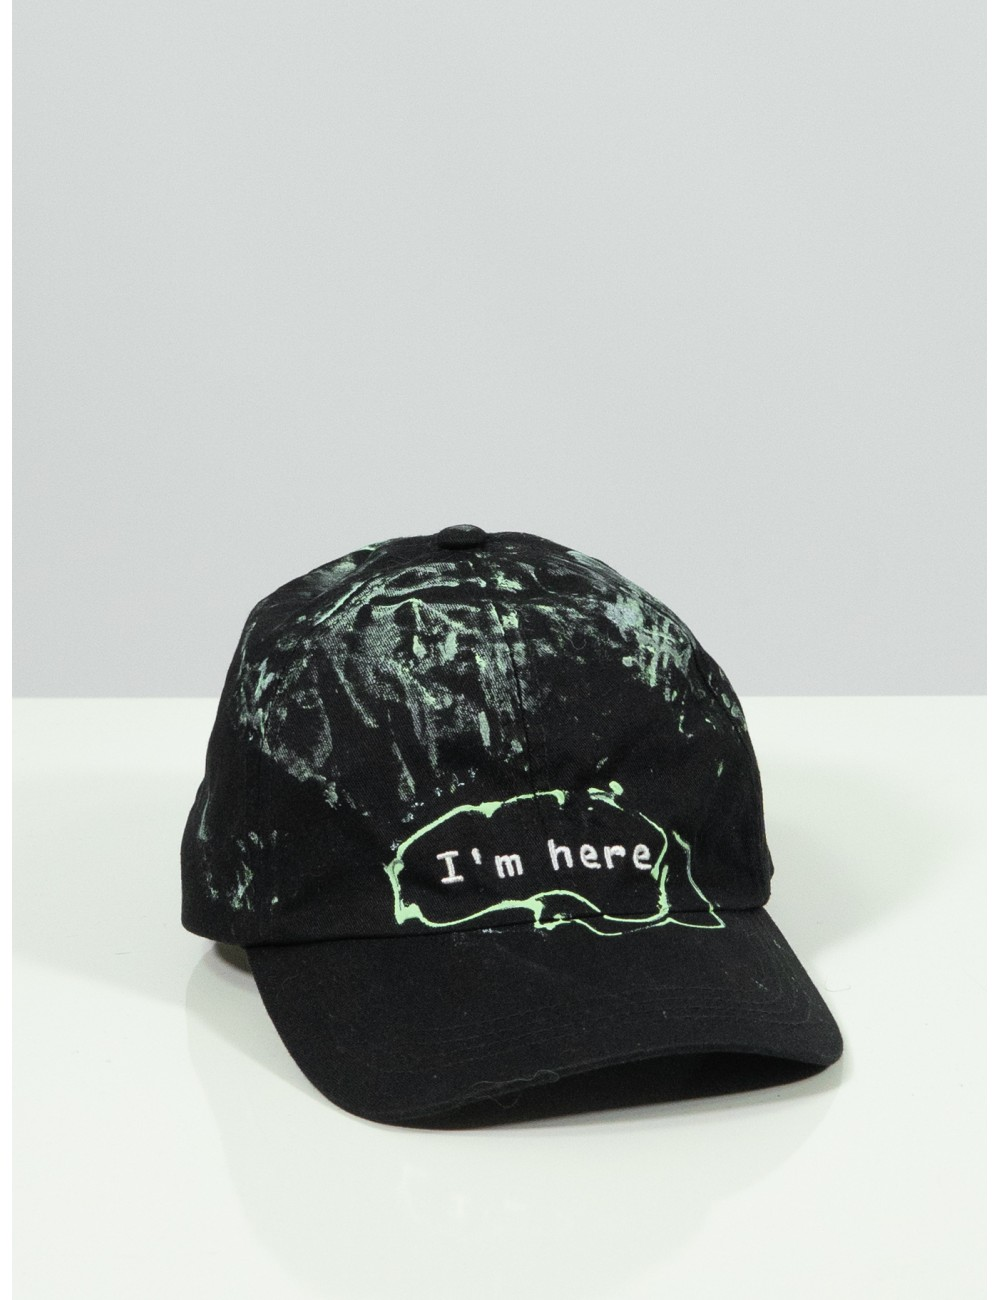 Upcycled black hat x Mira